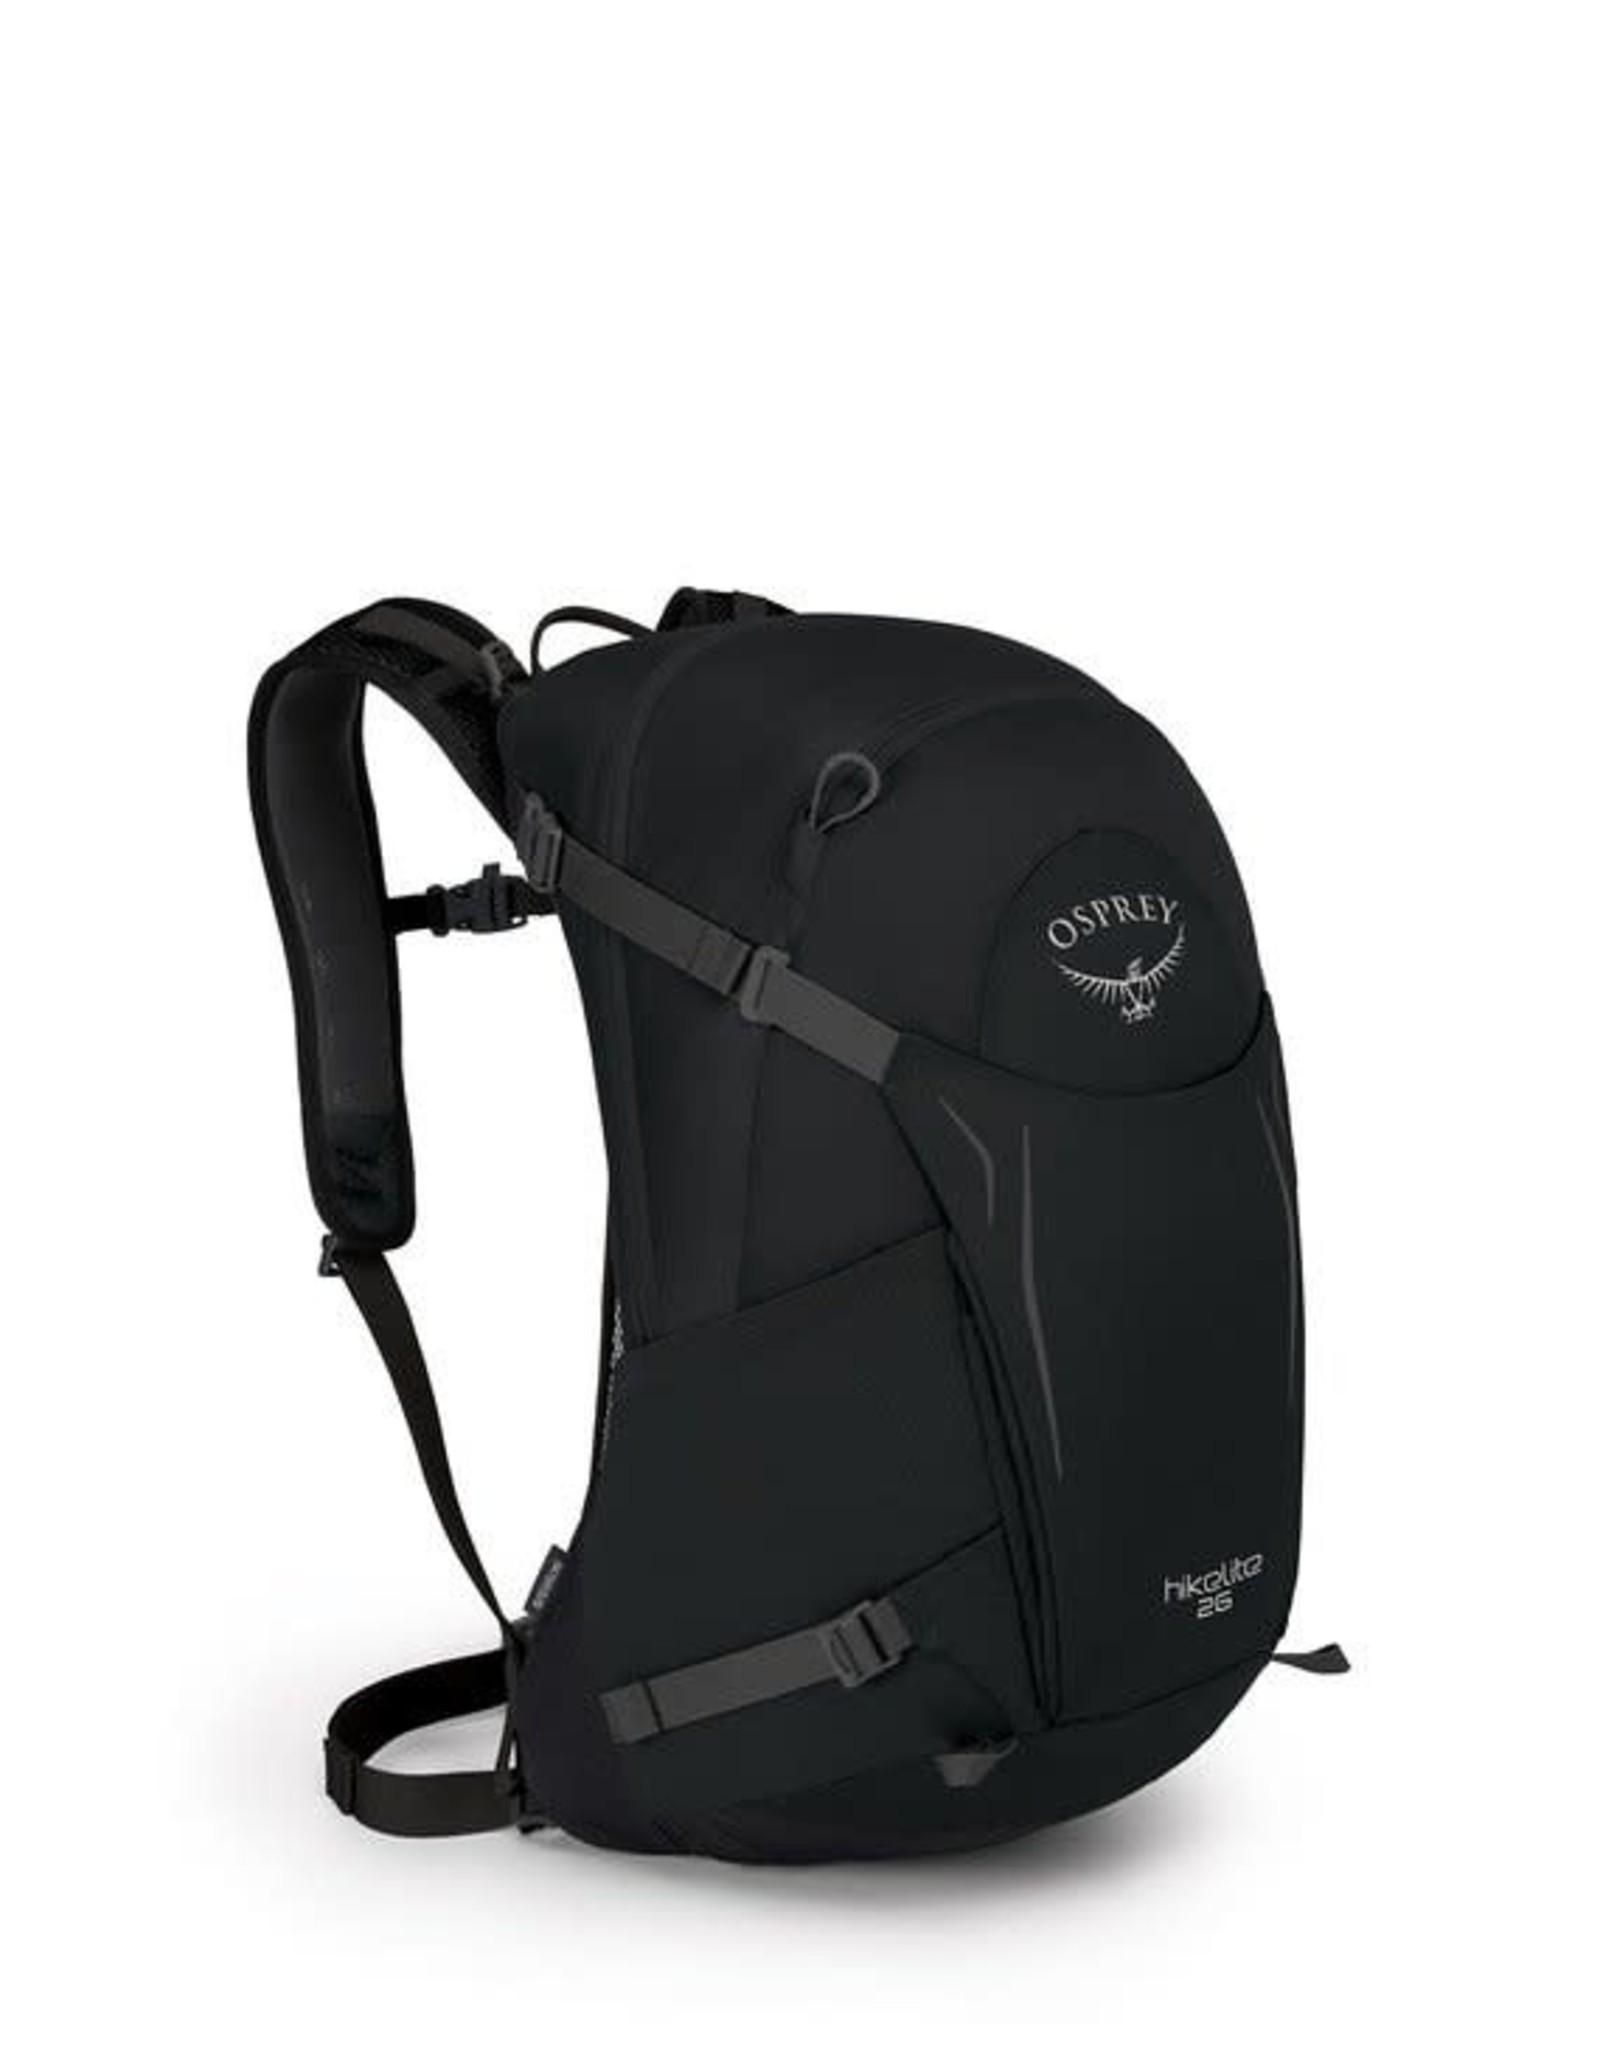 Osprey Osprey Hikelite 26 Hiking Pack